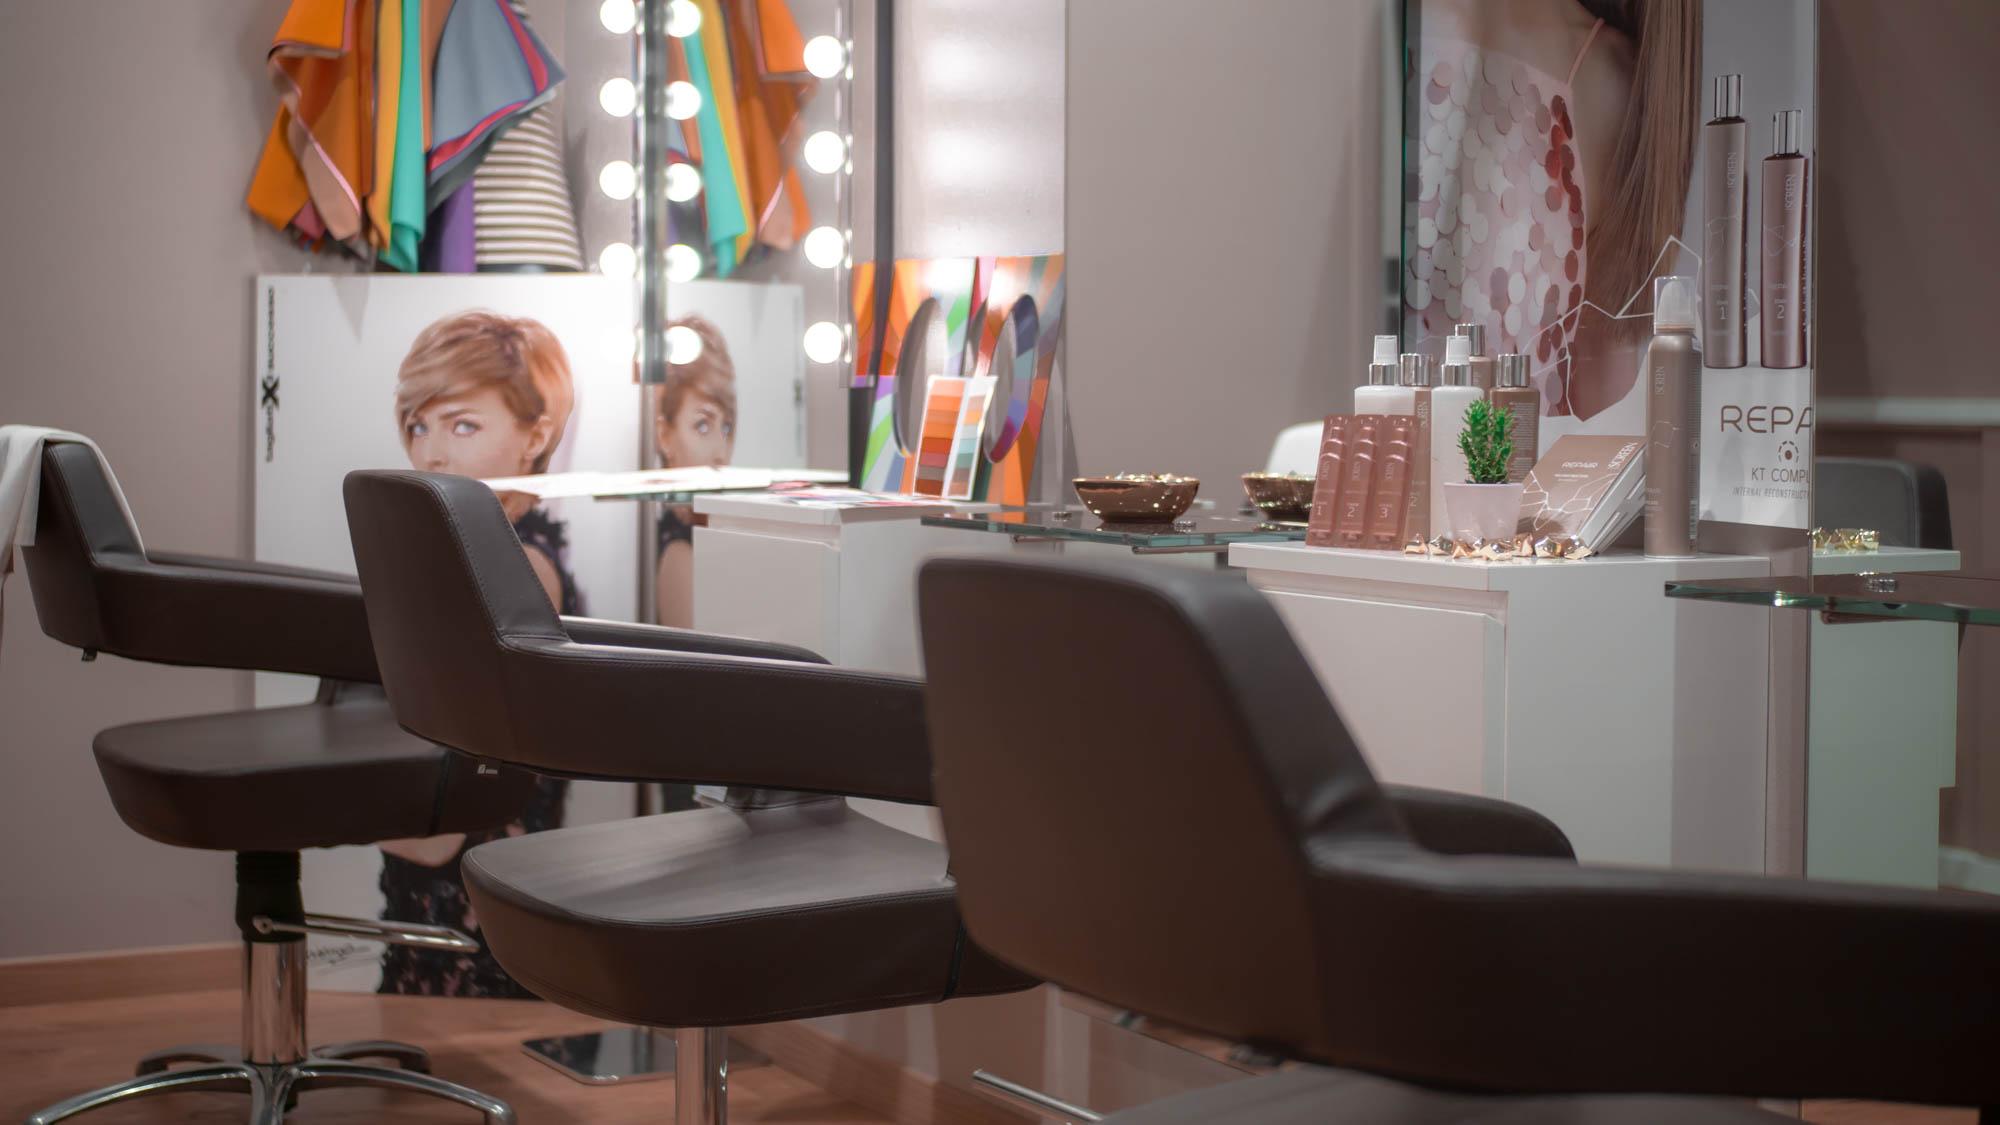 stranamente parrucchieri arredamento